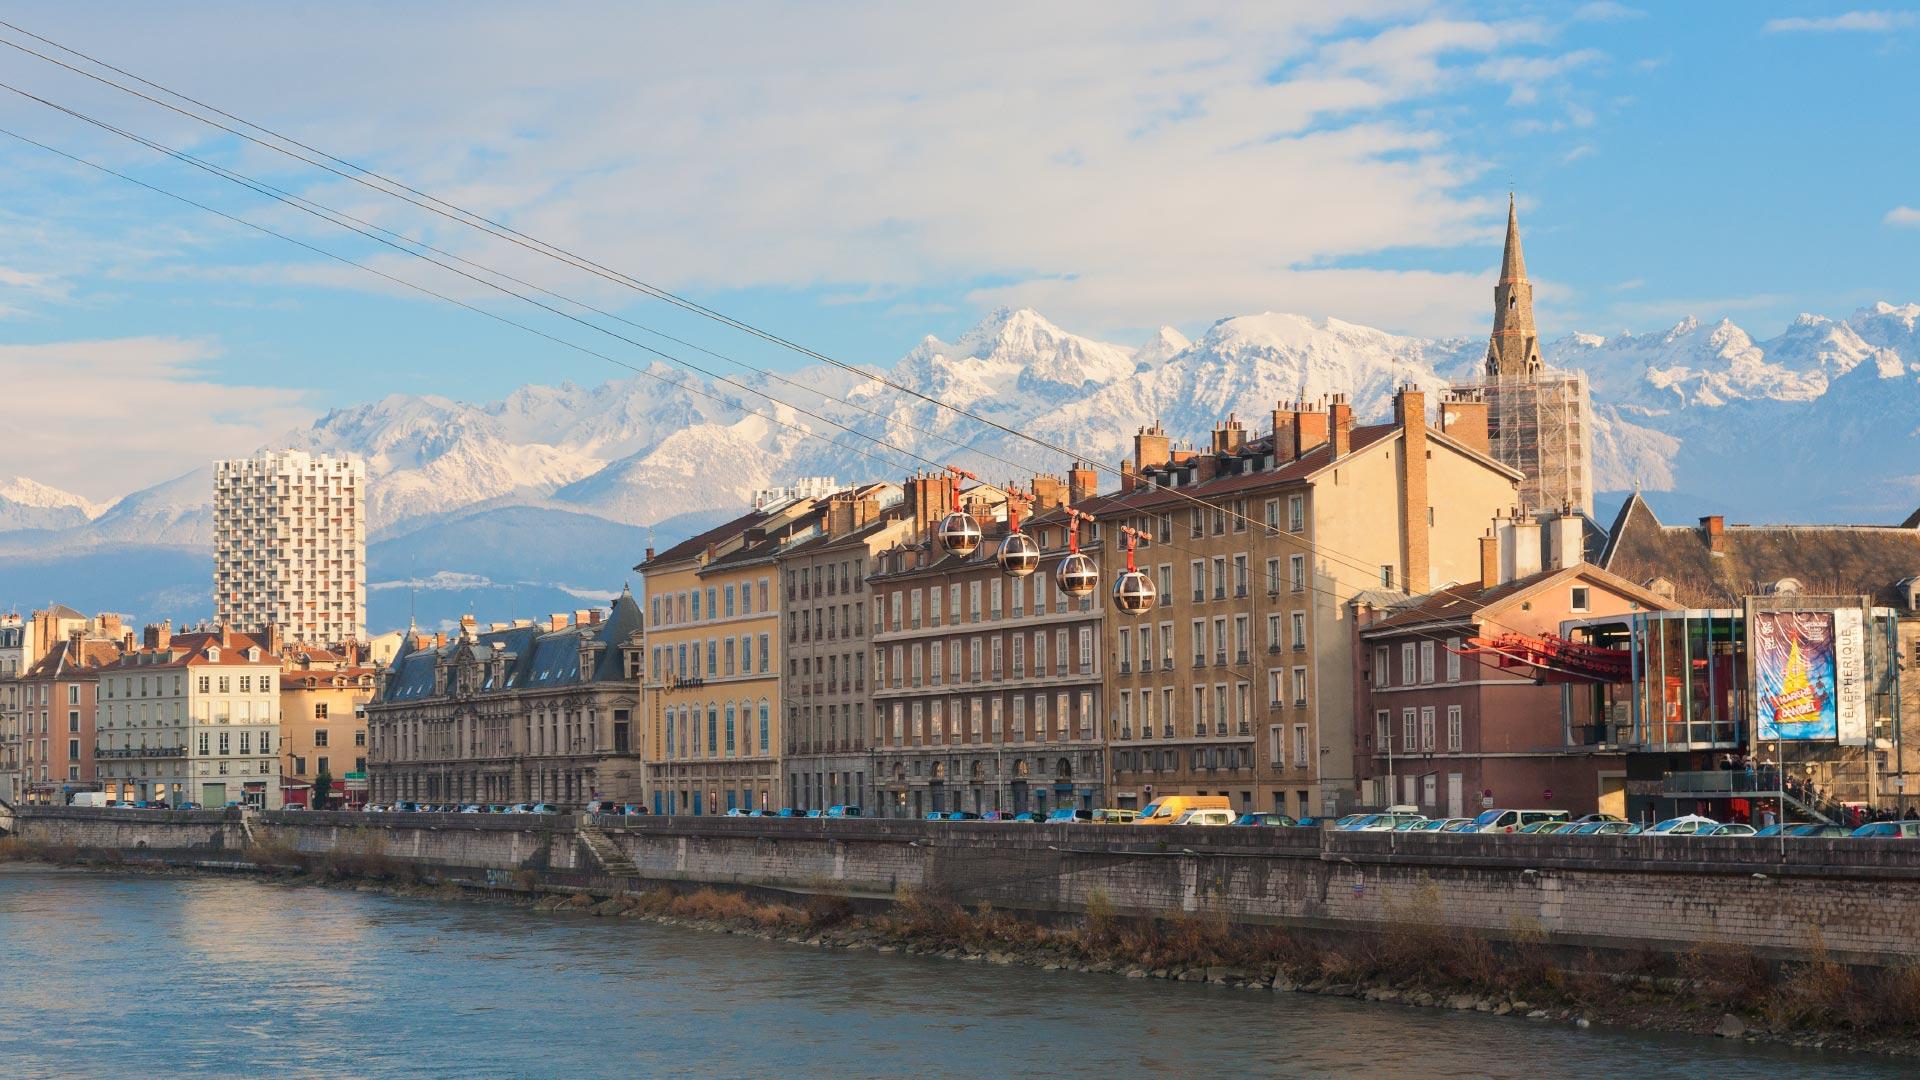 Maison-Barbillon-Hotel-Grenoble-Telepherique